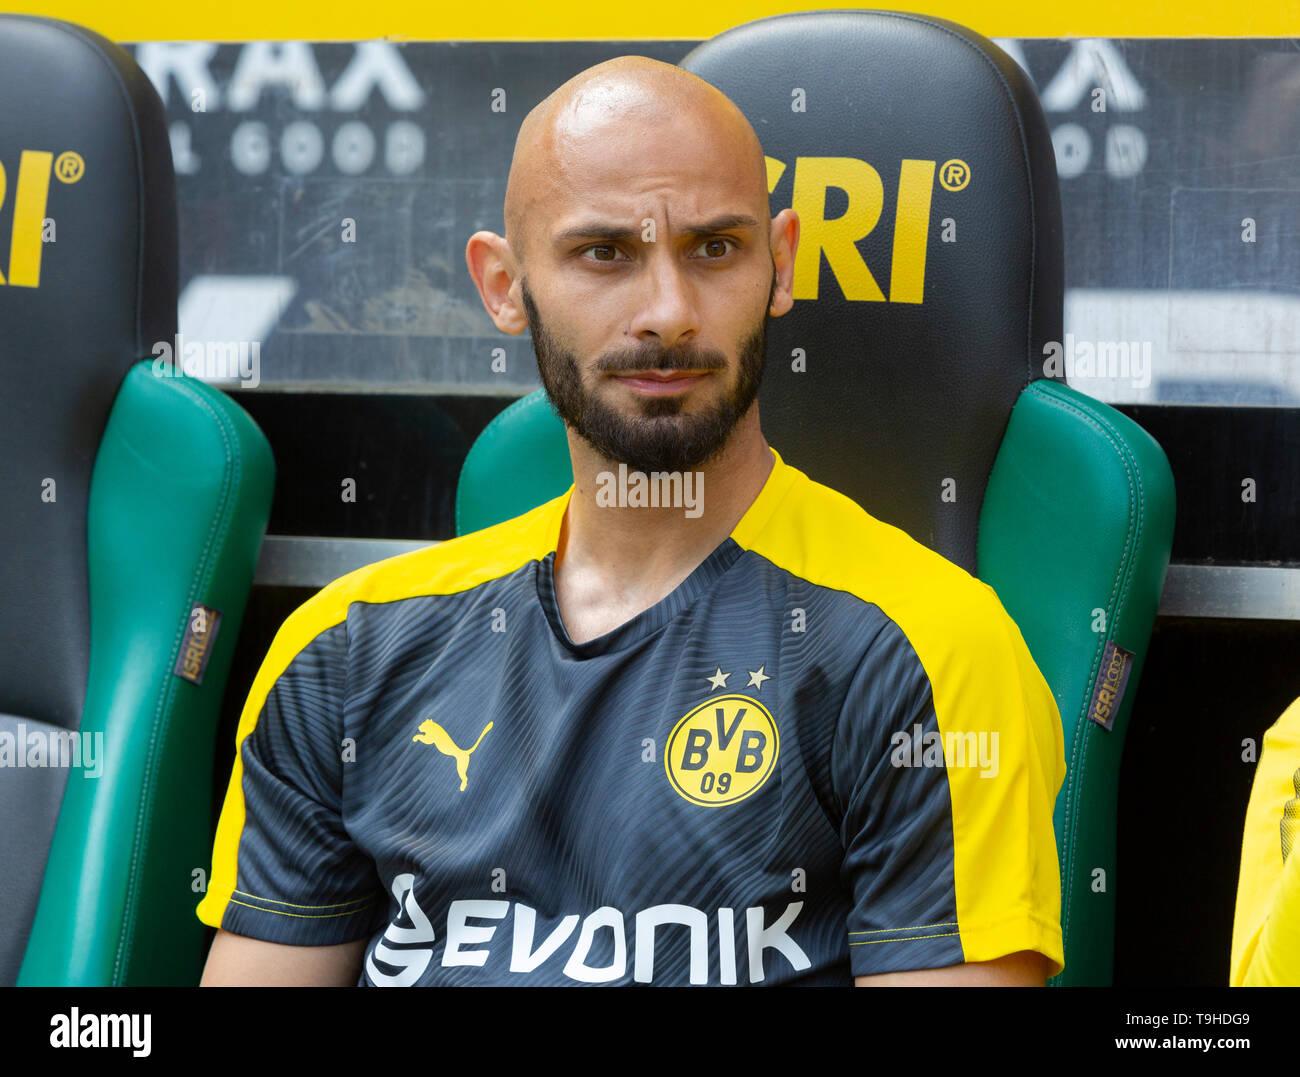 Sport, Fussball, Bundesliga, 2018/2019, Borussia Moenchengladbach vs. BVB Borussia Dortmund 0-2, Stadion Borussia-Park, Spielerbank, Oemer Toprak (BVB), DFL REGULATIONS PROHIBIT ANY USE OF PHOTOGRAPHS AS IMAGE SEQUENCES AND/OR QUASI-VIDEO, sports, football, Bundesliga, 2018/2019, Borussia Moenchengladbach vs. BVB Borussia Dortmund 0-2, Stadium Borussia Park, players bench, Oemer Toprak (BVB), DFL REGULATIONS PROHIBIT ANY USE OF PHOTOGRAPHS AS IMAGE SEQUENCES AND/OR QUASI-VIDEO *** Local Caption *** sports, football, Bundesliga, 2018/2019, Borussia Moenchengladbach vs. BVB Borussia Dortmund 0-2 - Stock Image